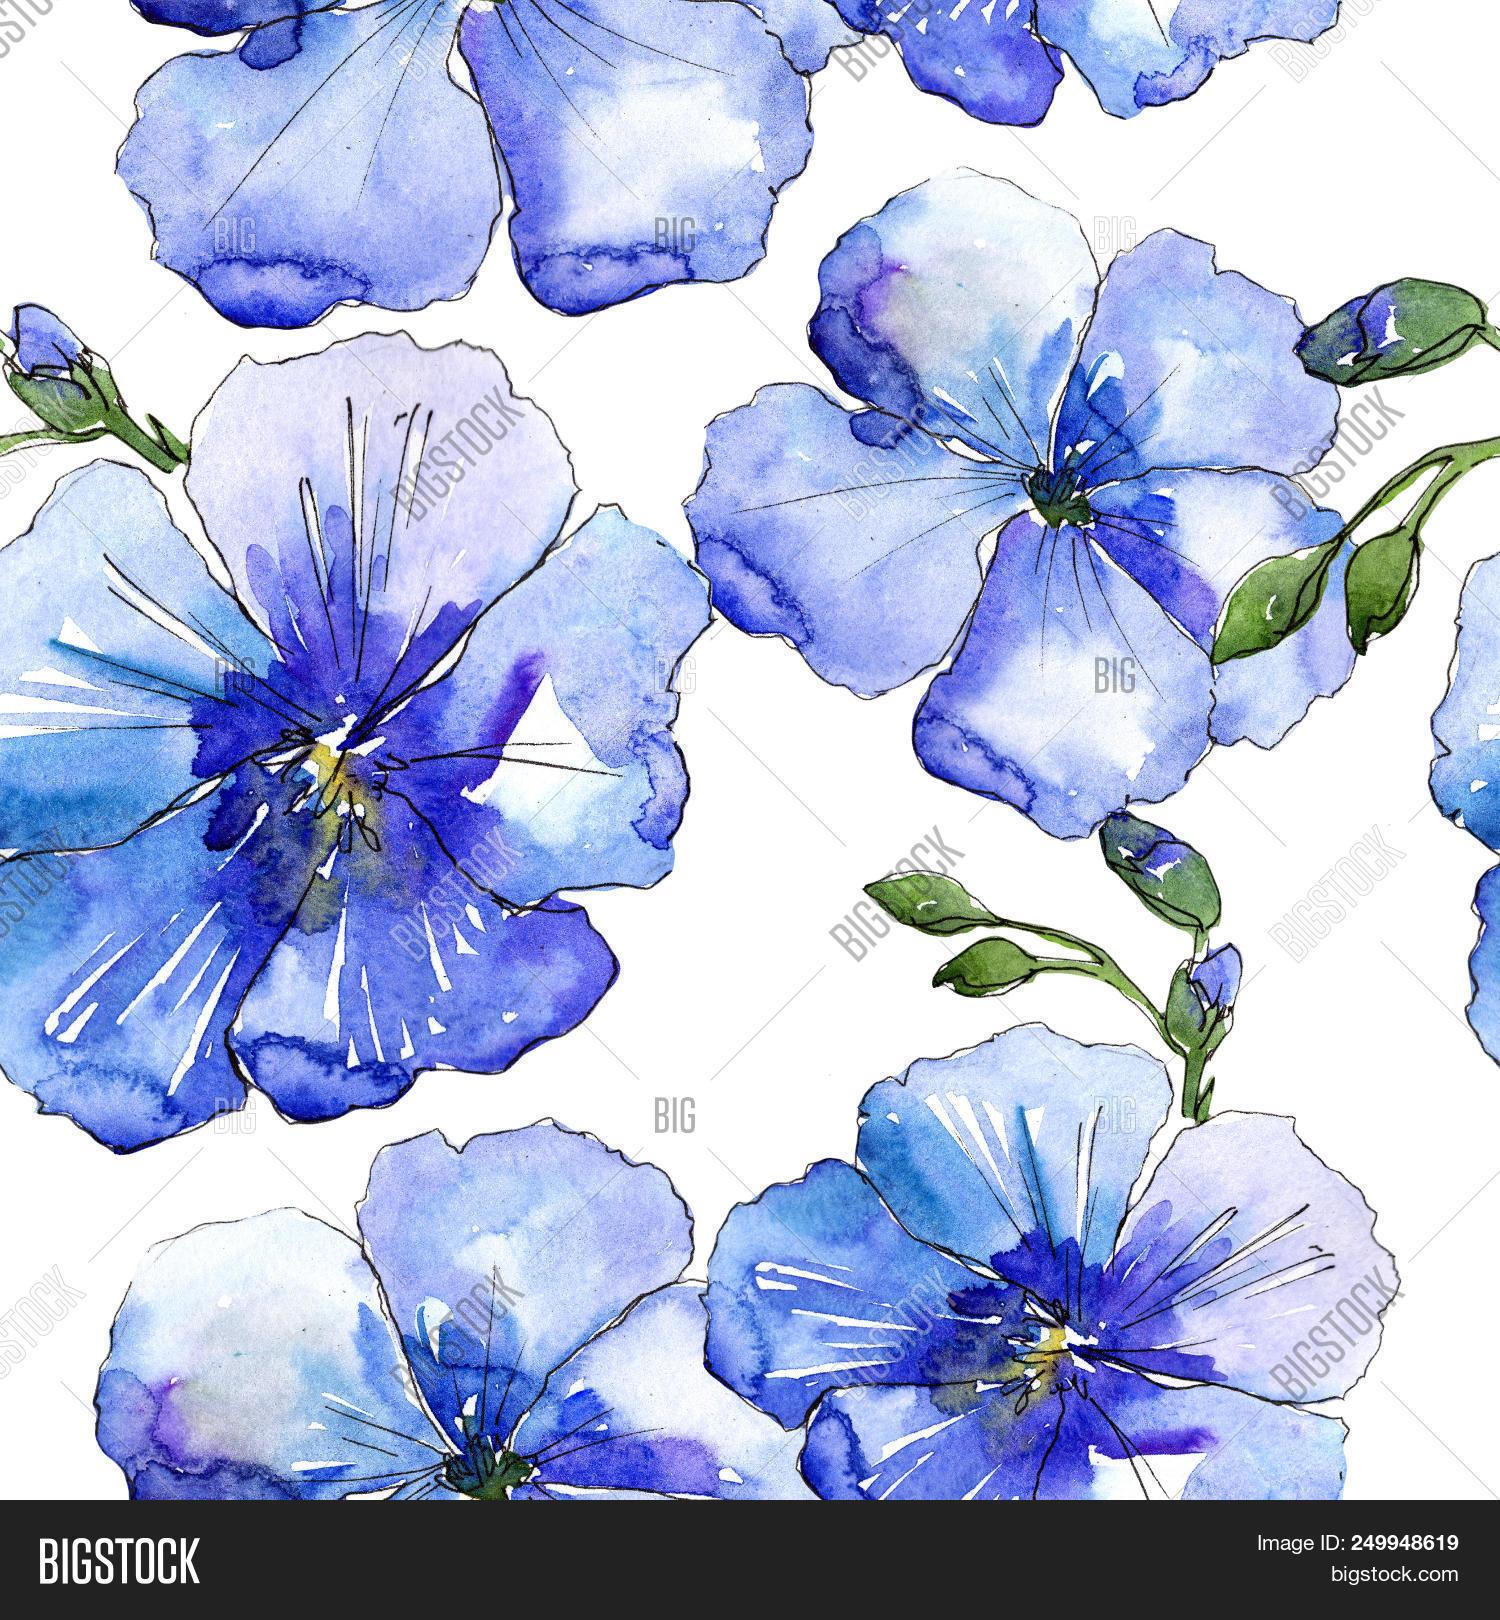 Blue Flax Flower Image Photo Free Trial Bigstock